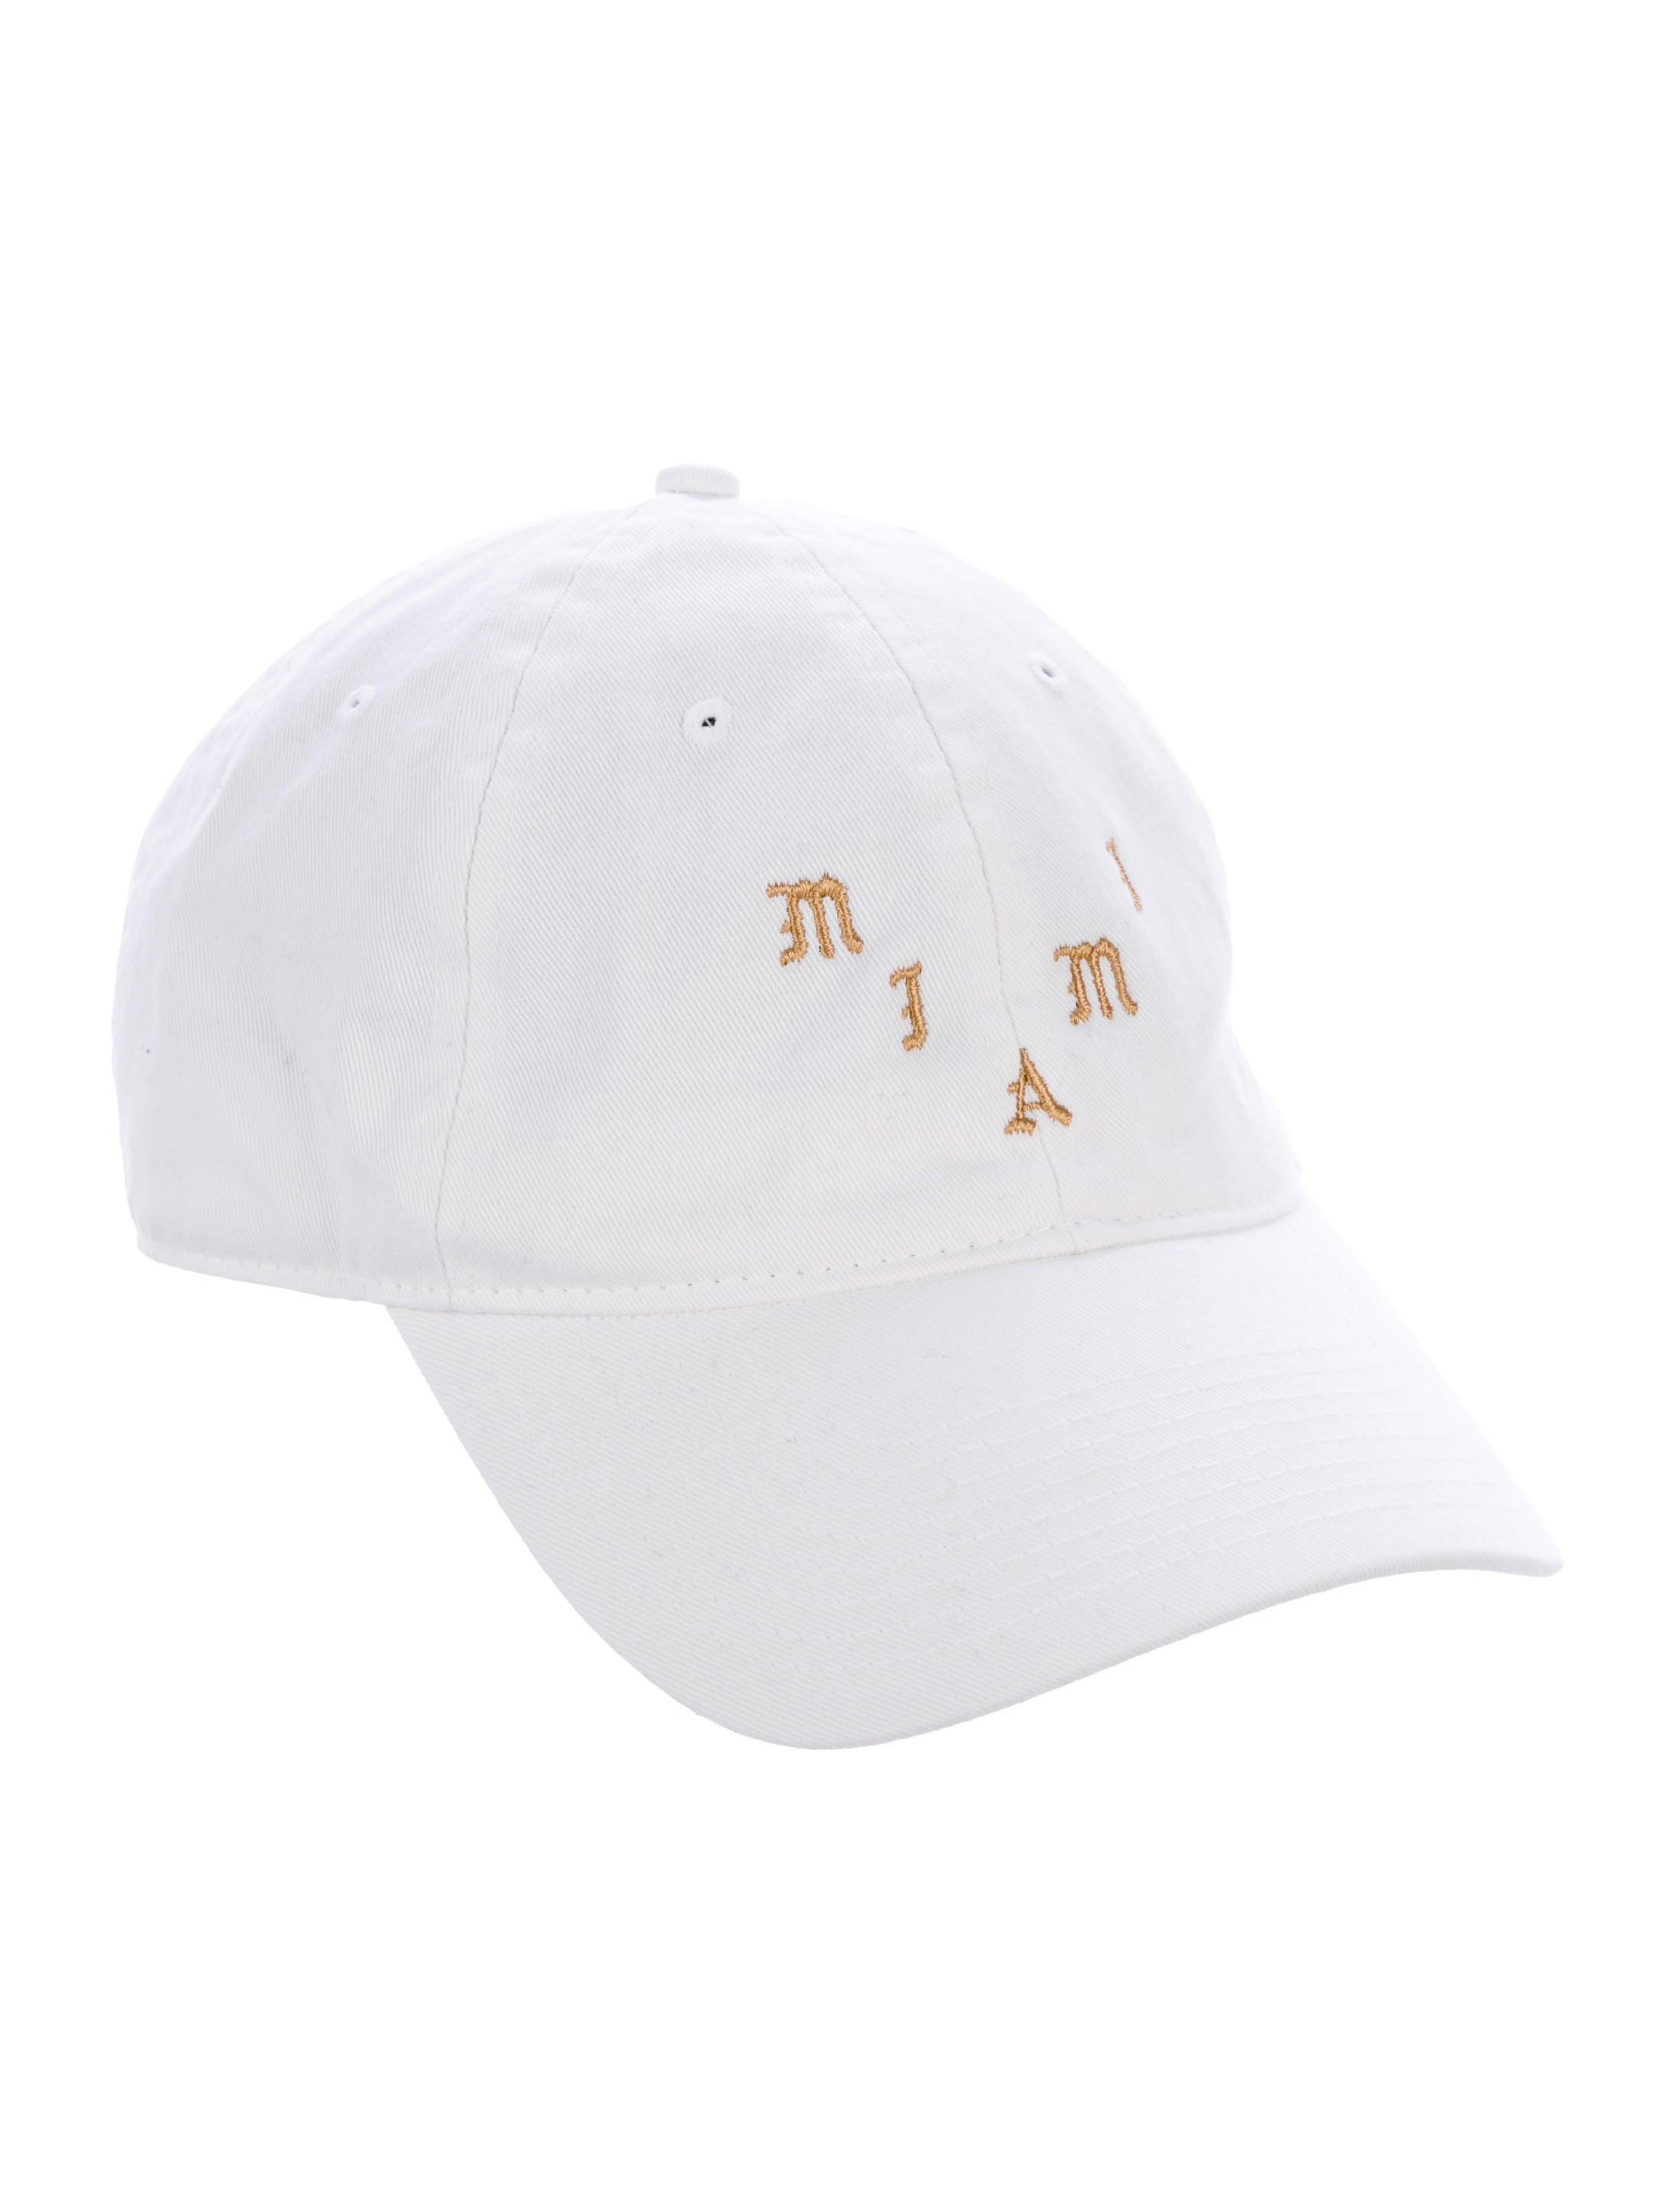 5ddcf9d33e563 Yeezy Miami Pablo Hat - Accessories - WYEEZ20804